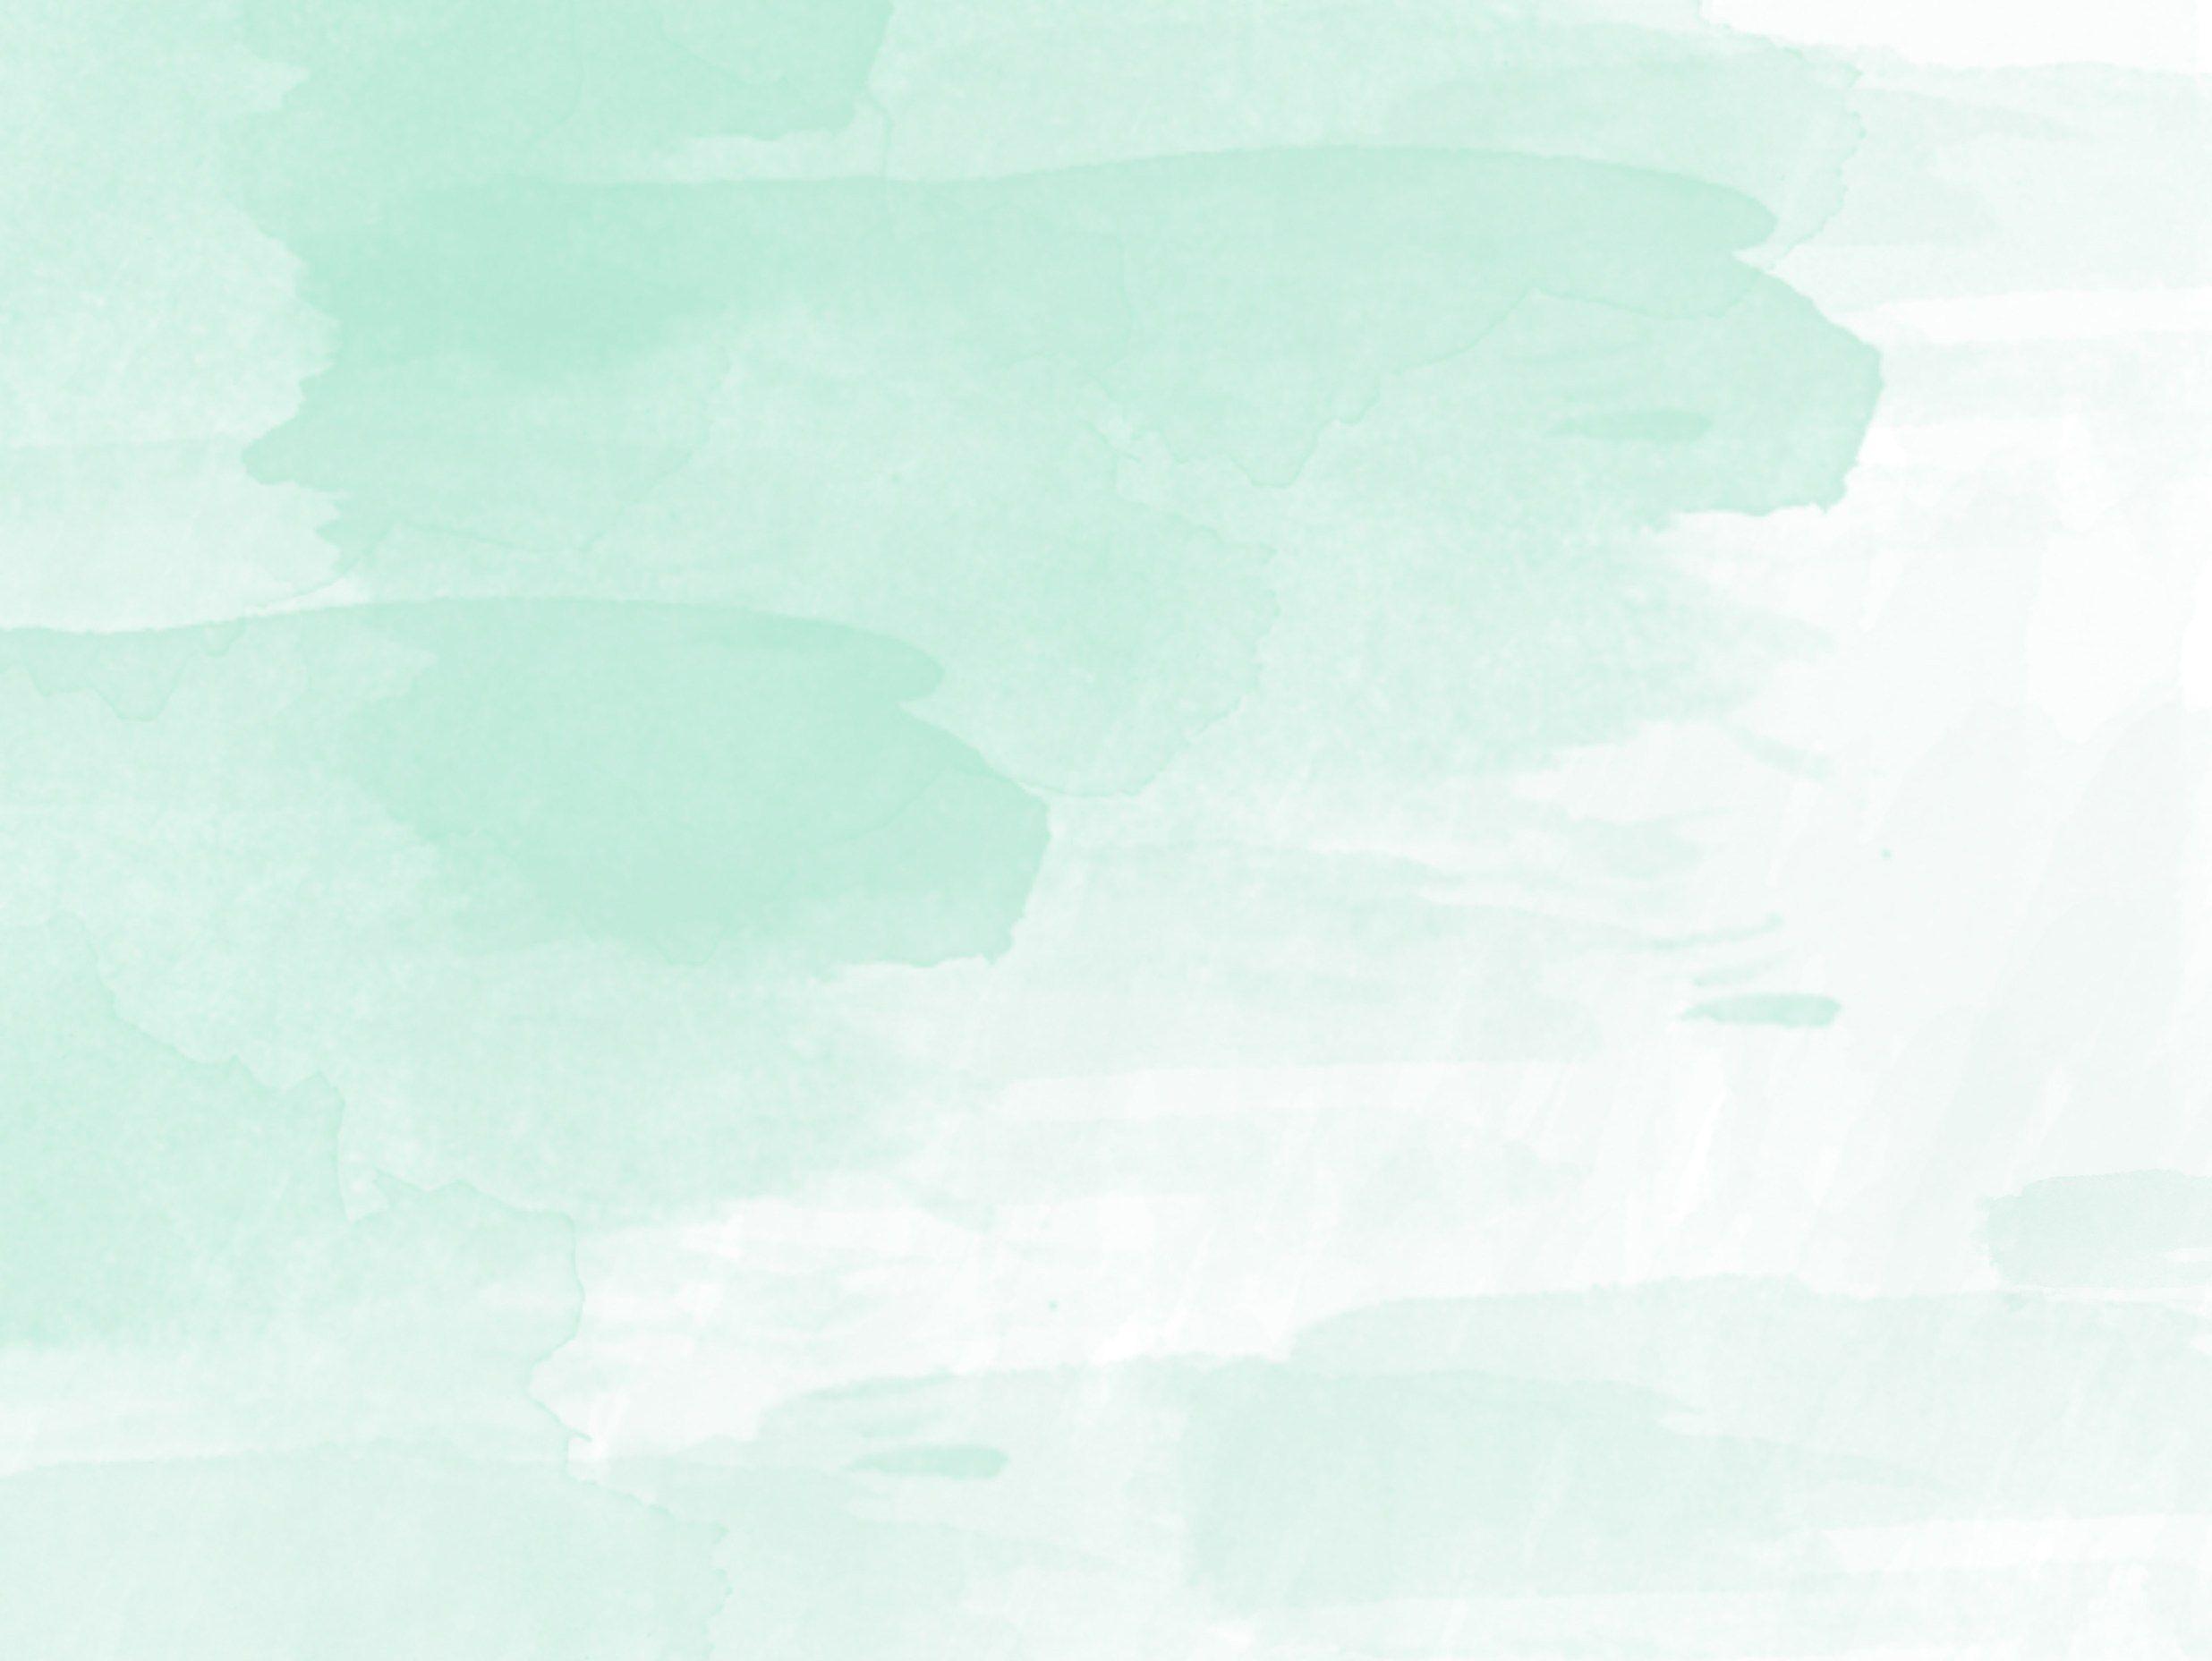 Mint+Watercolor+Wallpaper_Pixejoo Anna Rosso Eventi